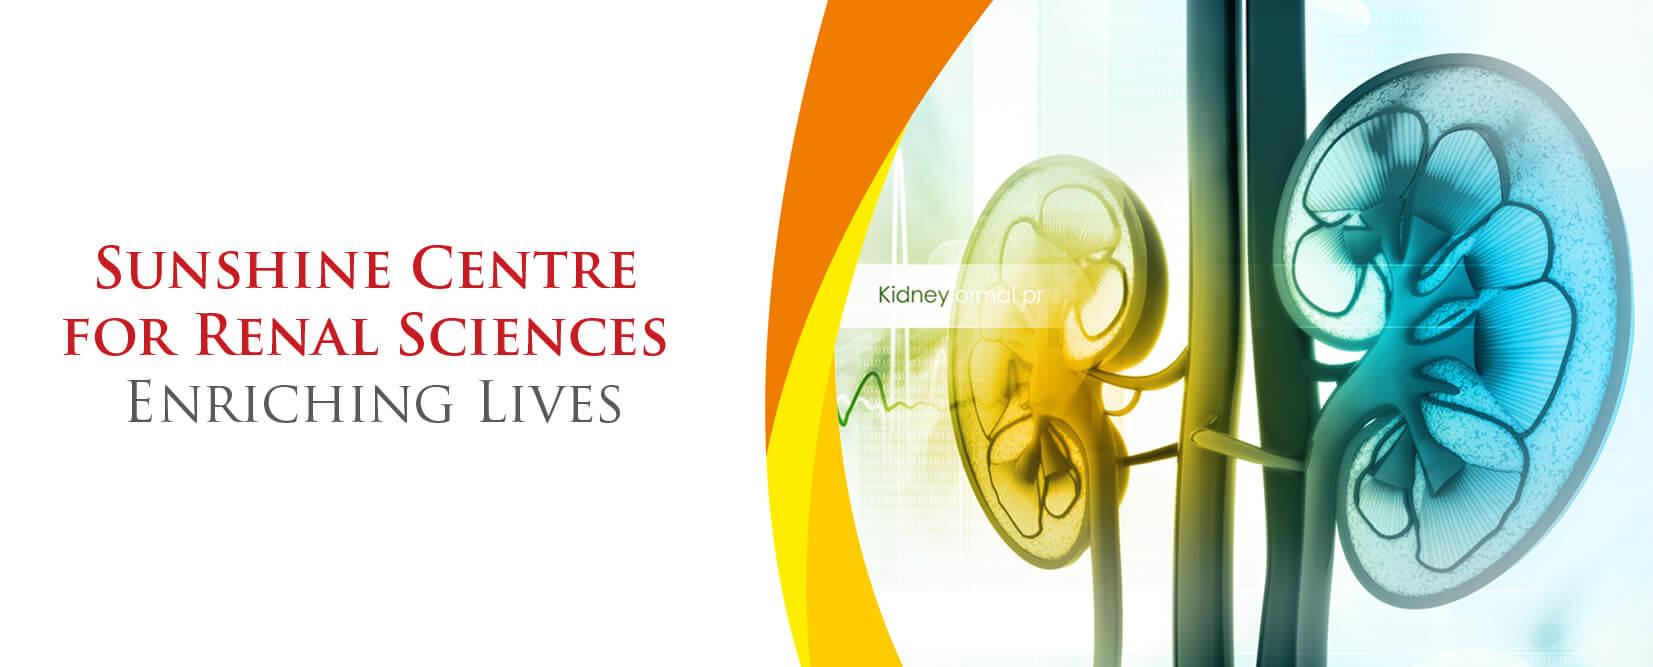 Treatment for dialysis & hemodialysis - sunshinehospitals